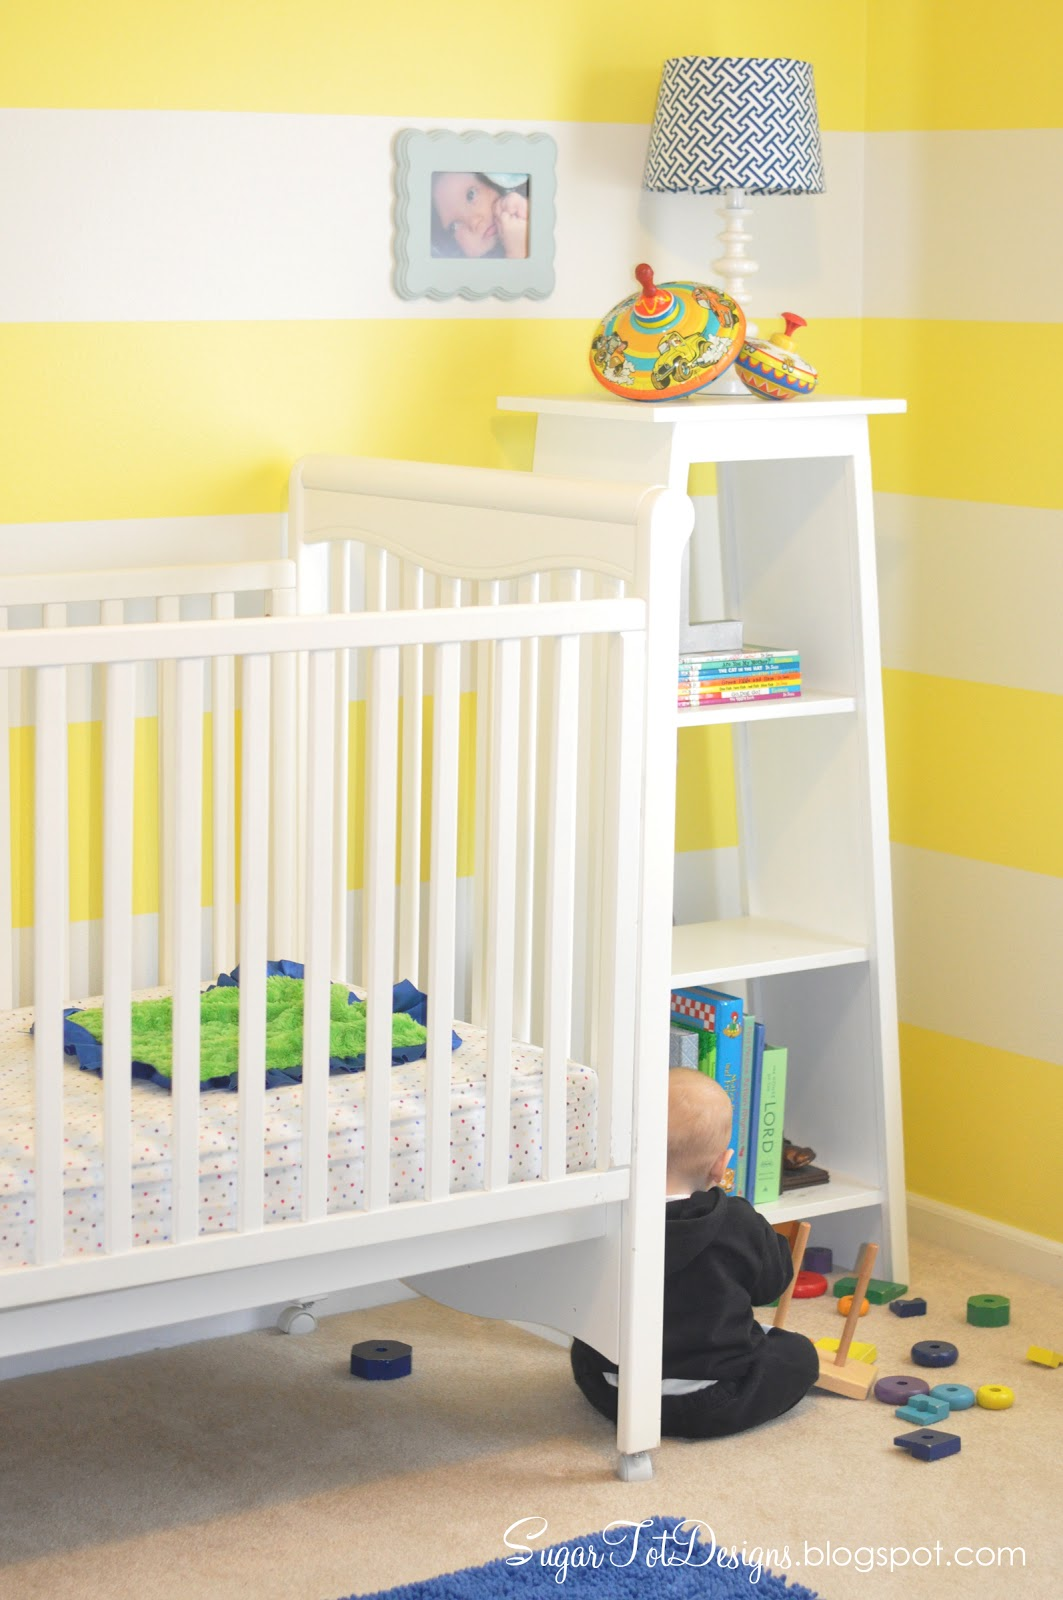 sugartotdesigns: Yellow Striped Nursery ***UPDATE***